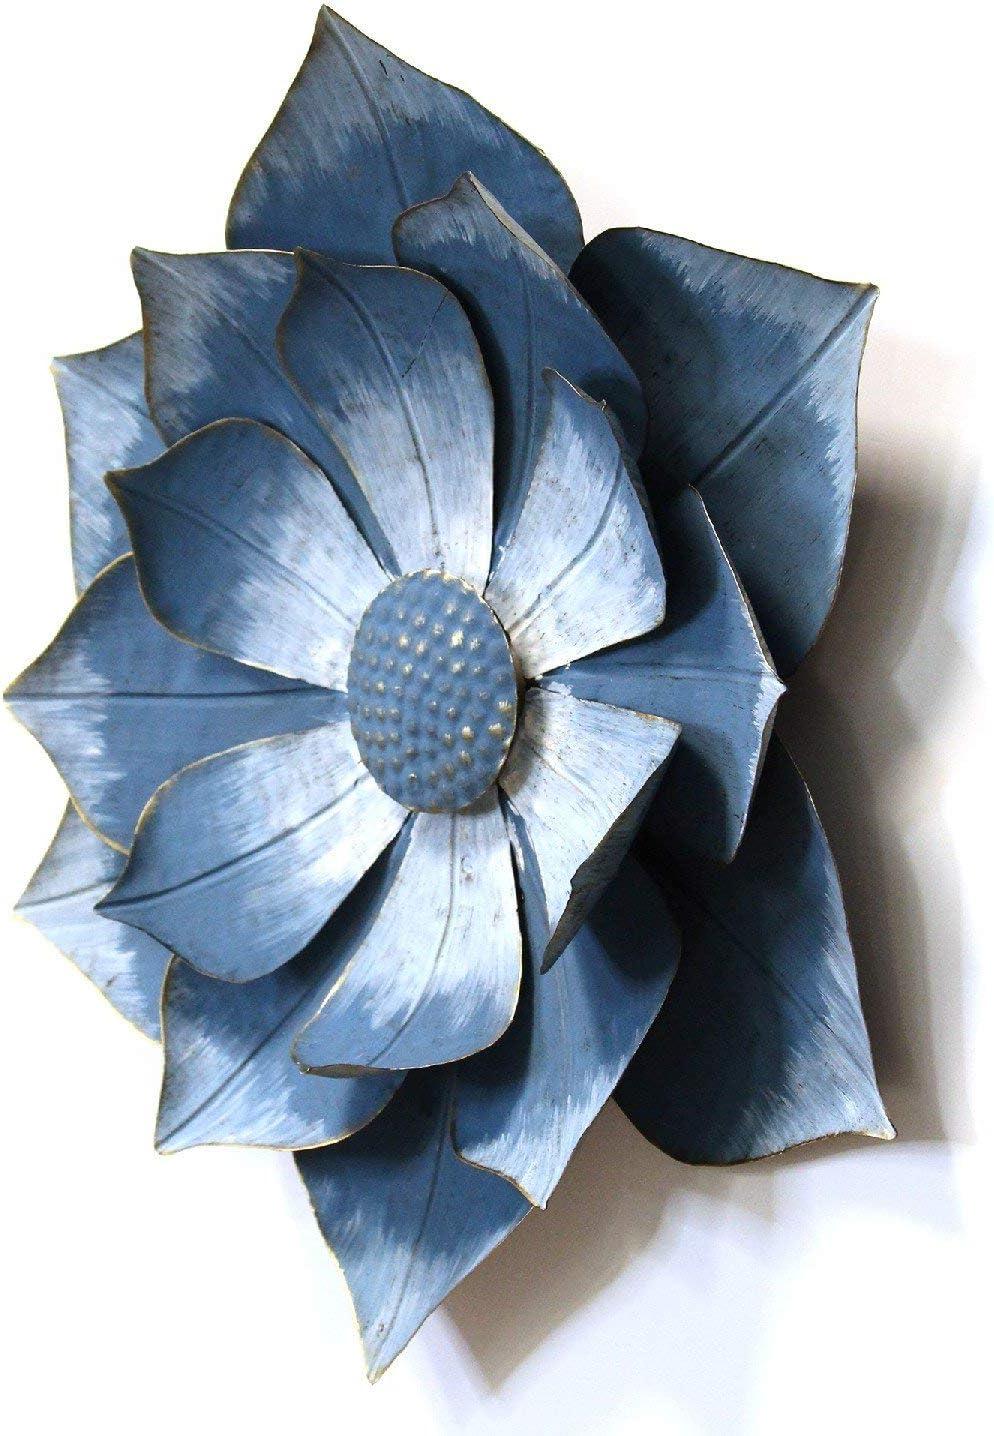 Extraordinaire  Mot-Clé Stratton Home Décor Stratton Home Decor Blue Ipomoea Metal Flower, 32.32